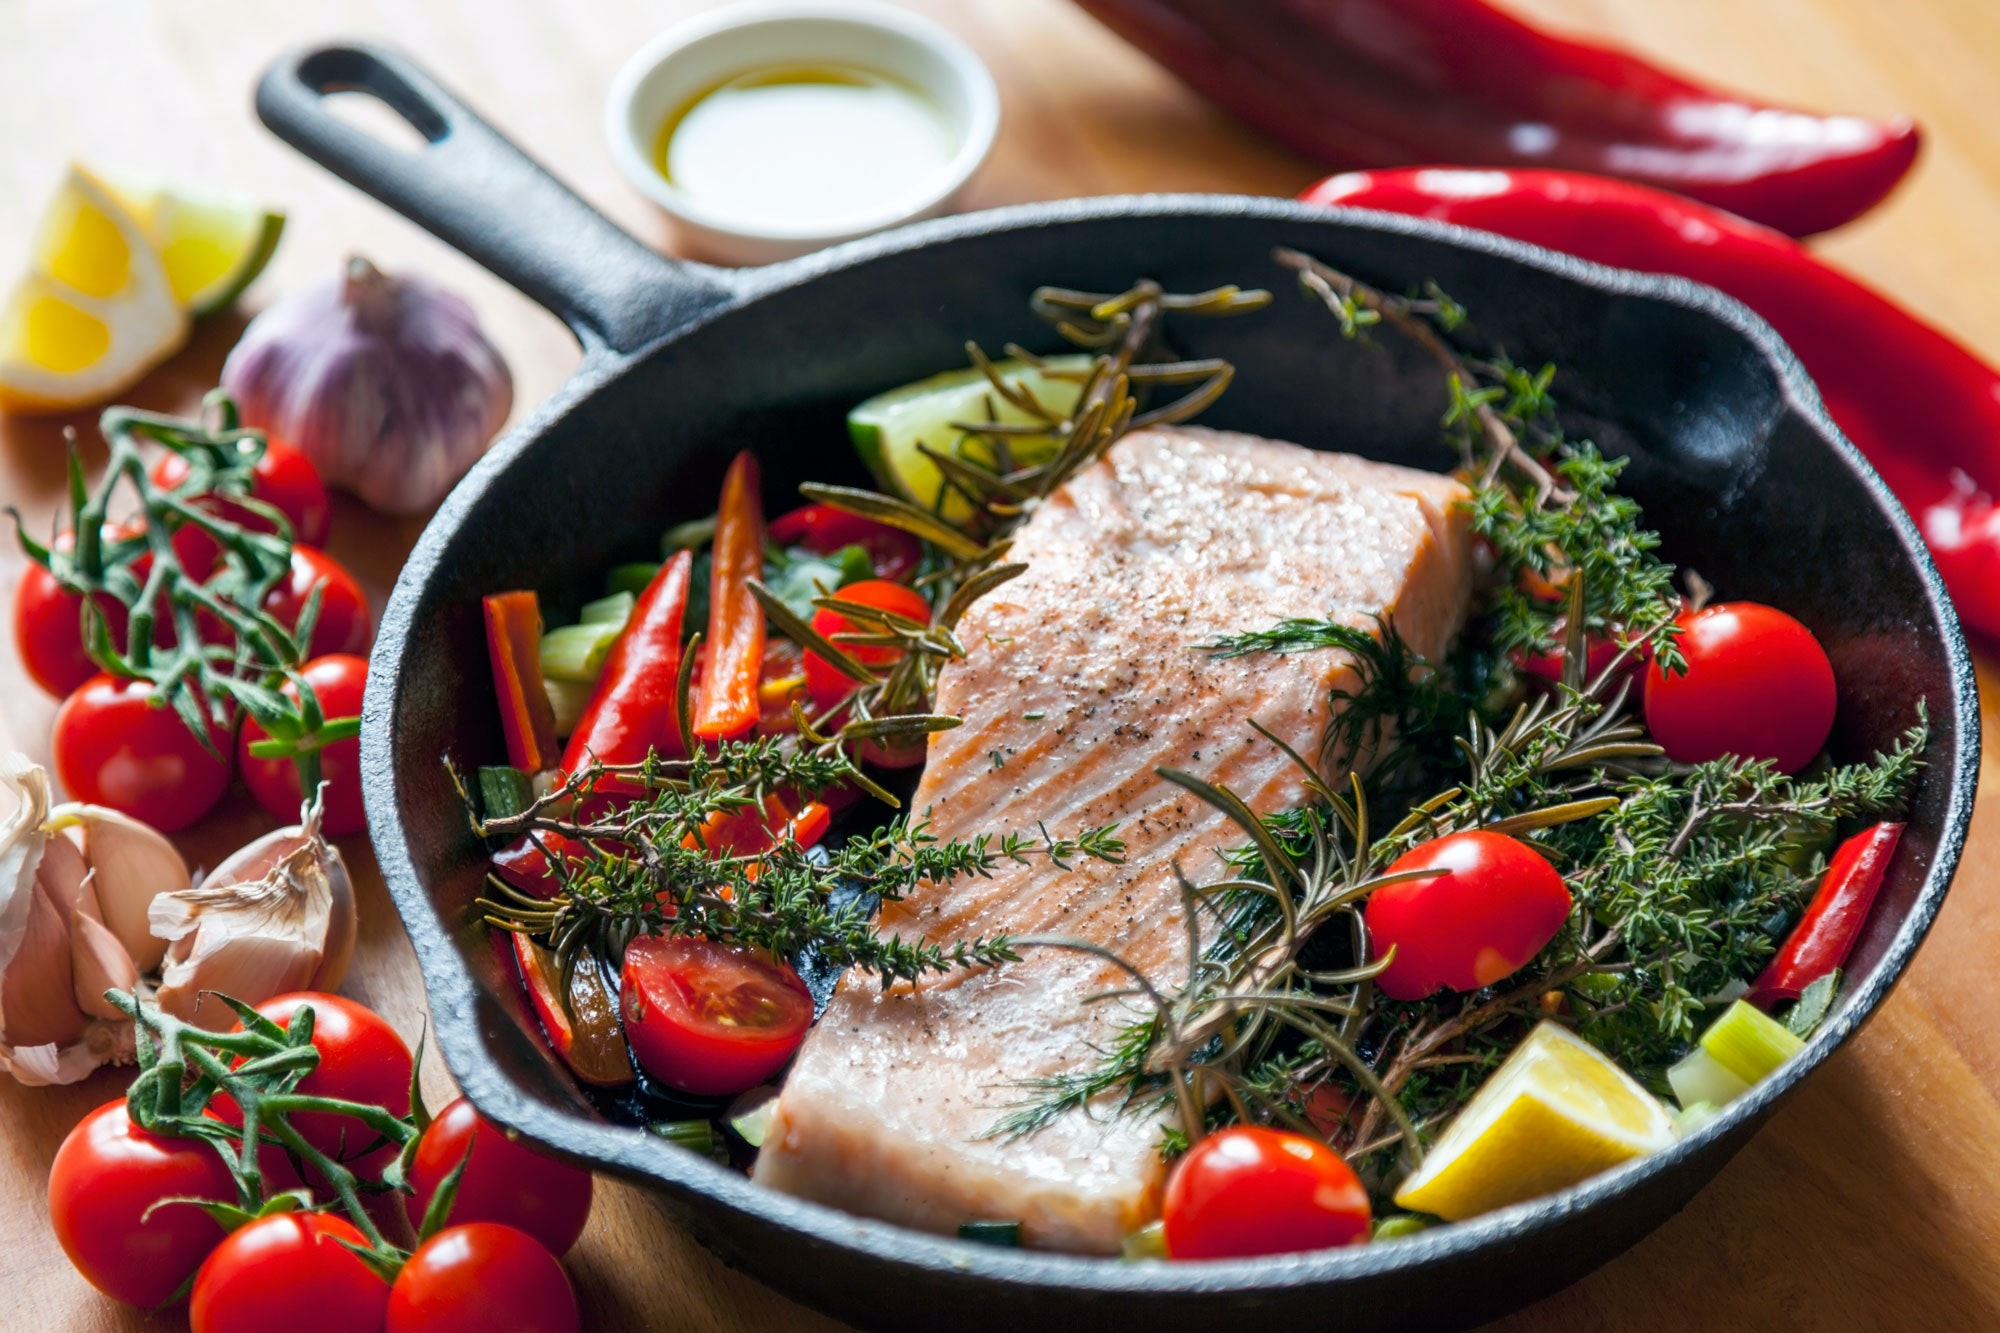 kød og grøntsager kur opskrifter